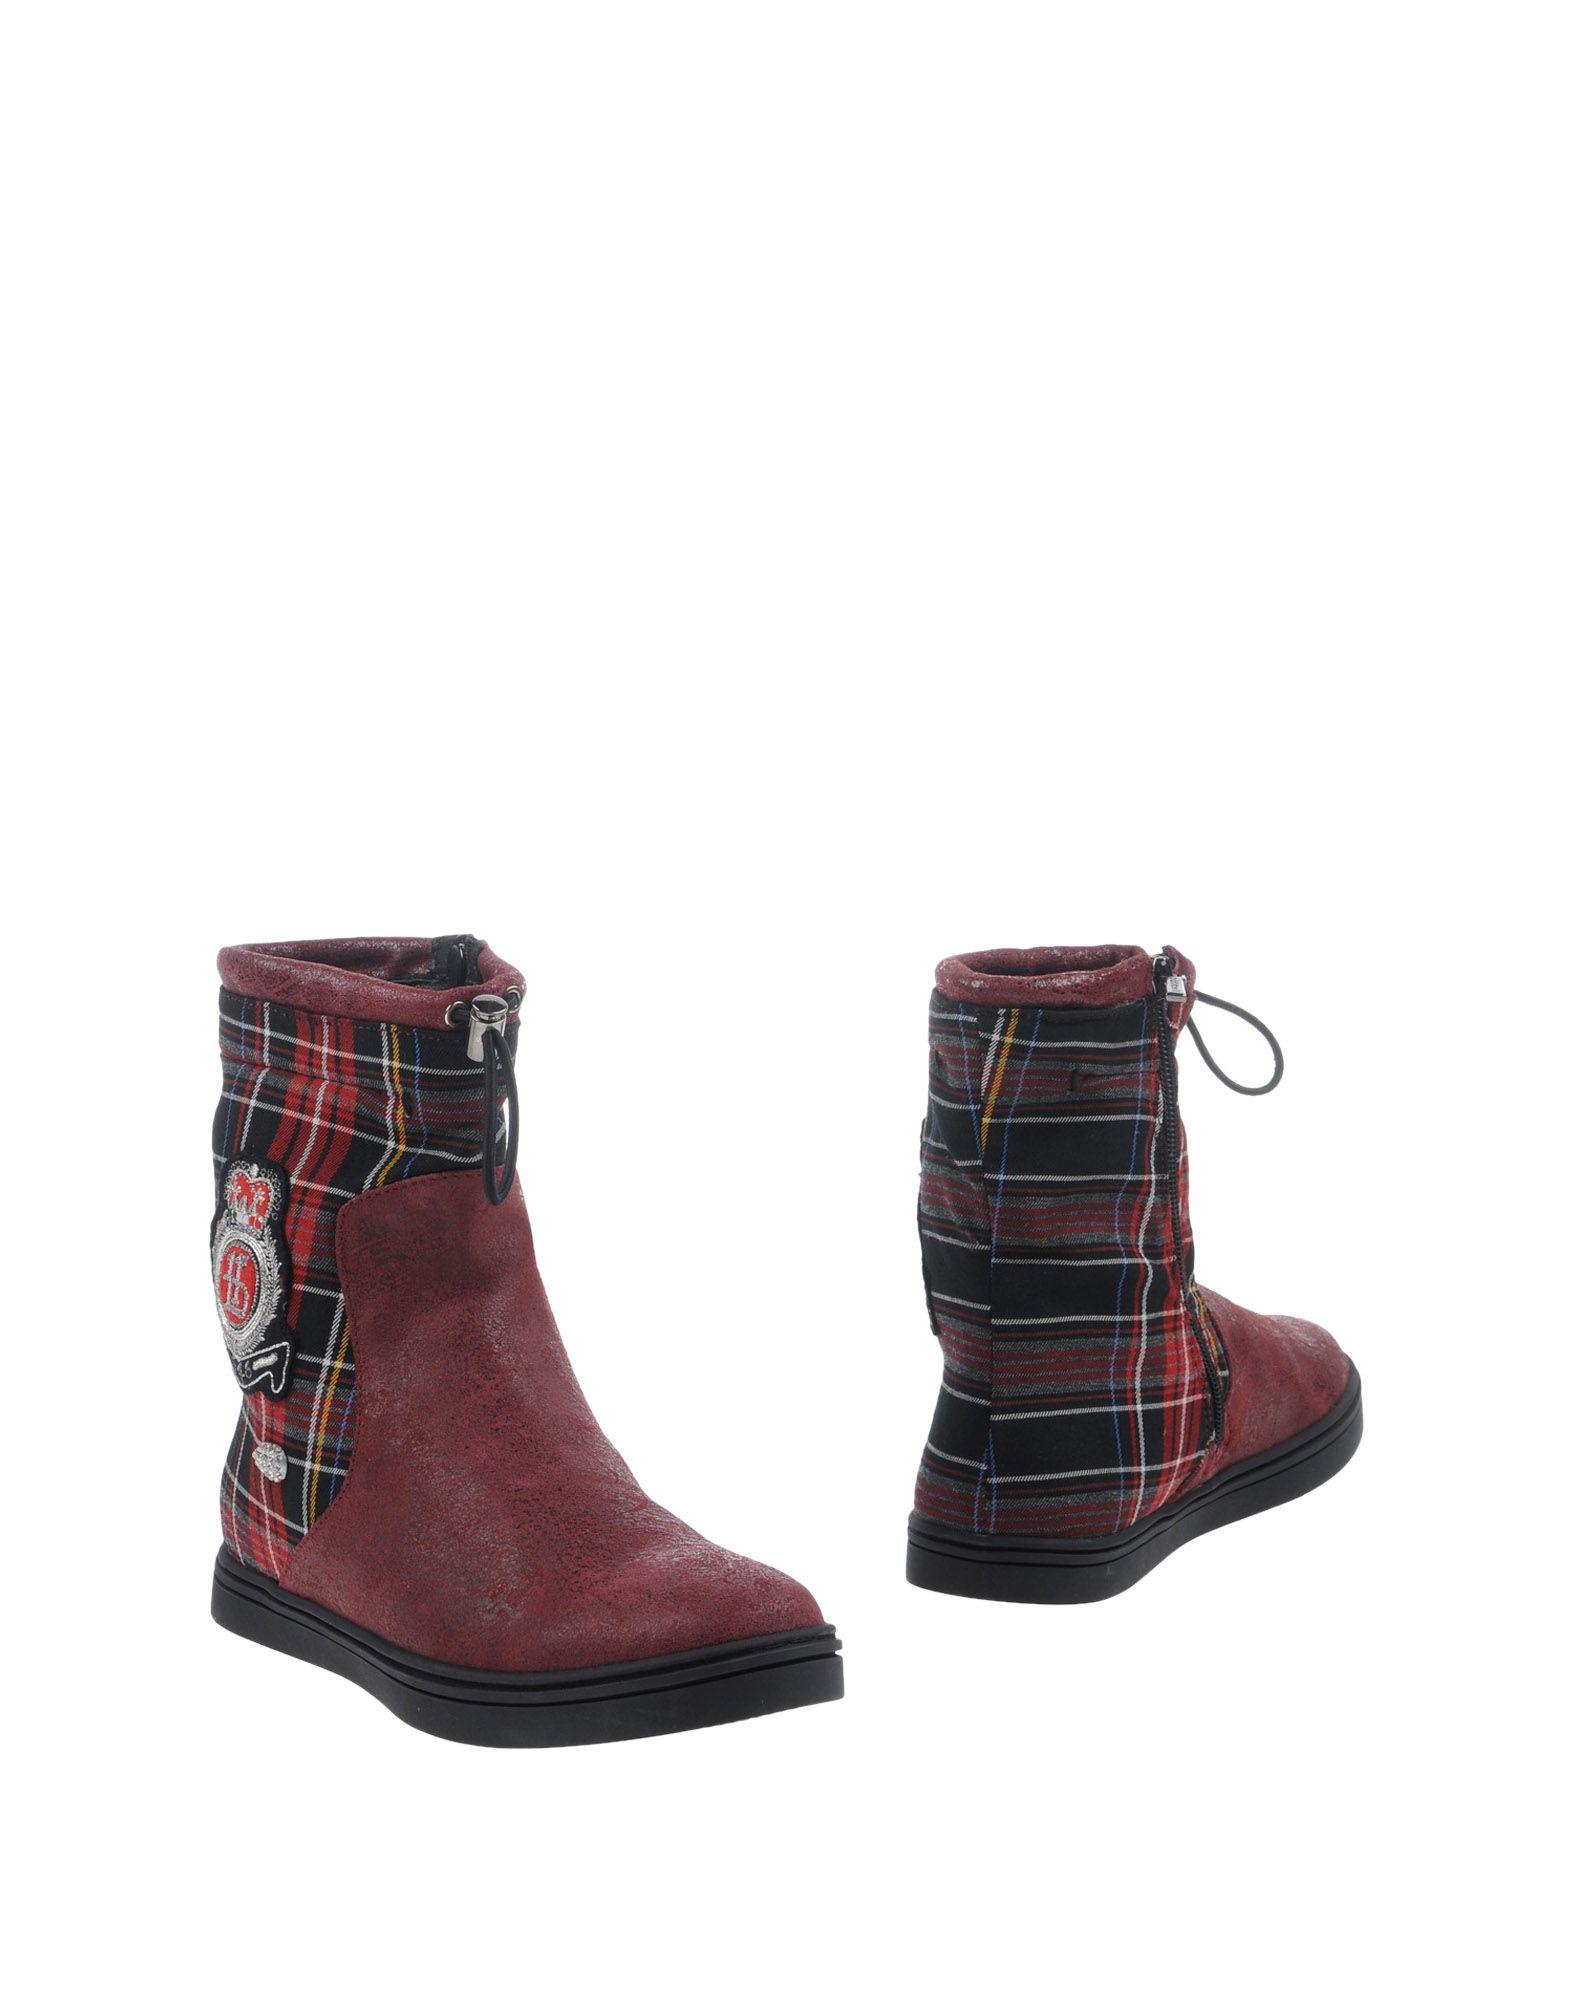 roberto botticelli luxury полусапоги и высокие ботинки BOTTICELLI LIMITED Полусапоги и высокие ботинки